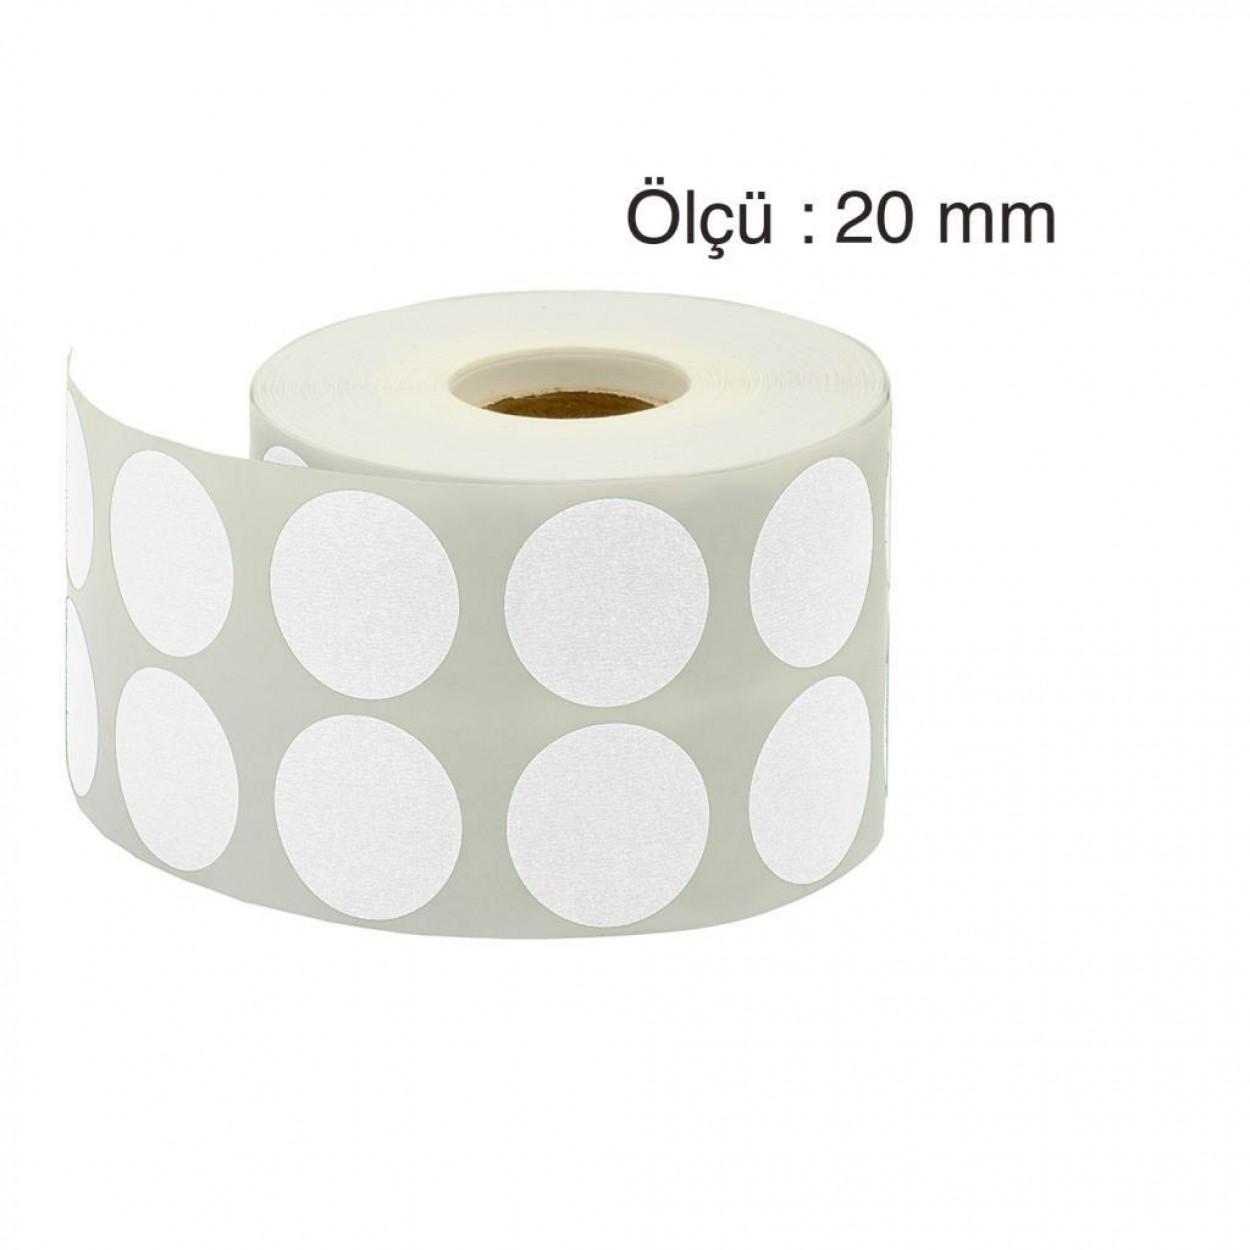 Tanex Nokta Etiket 20 mm 2500 Adet Gri